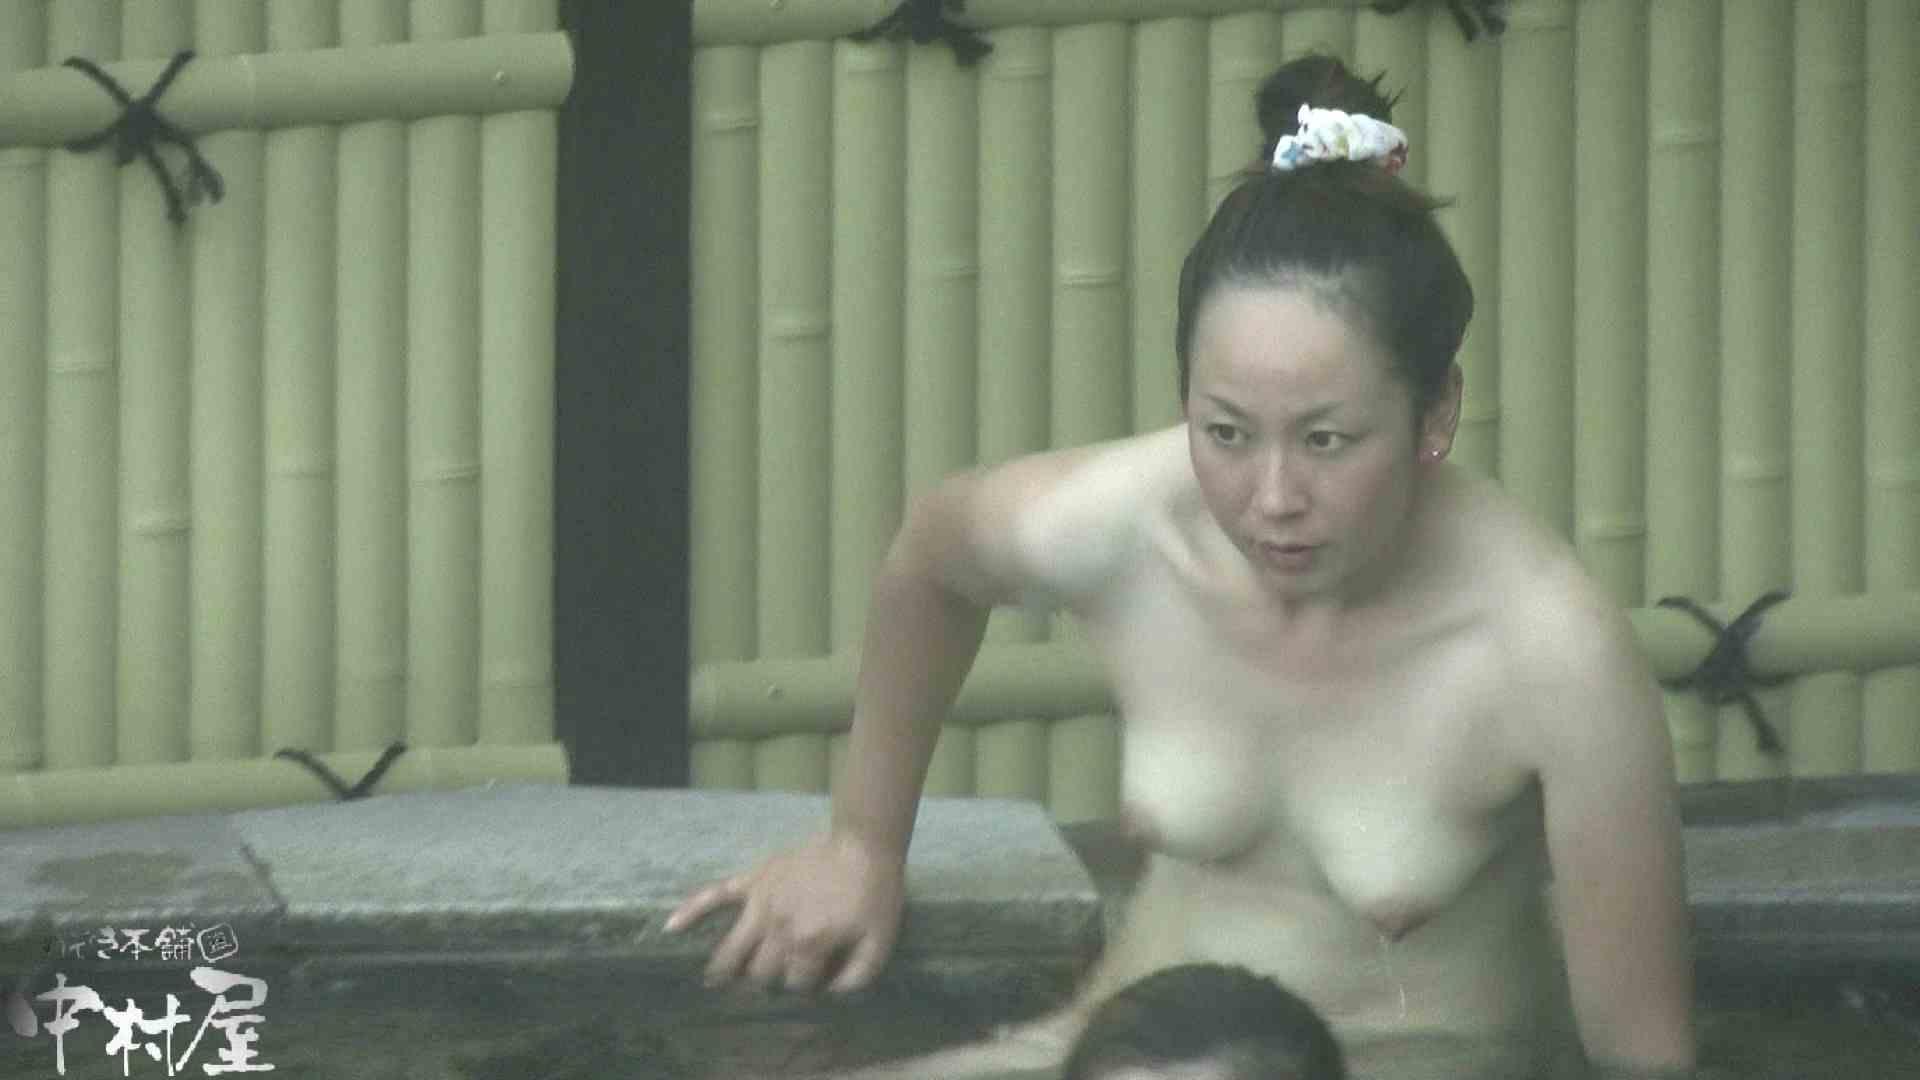 Aquaな露天風呂Vol.911 0  88連発 28